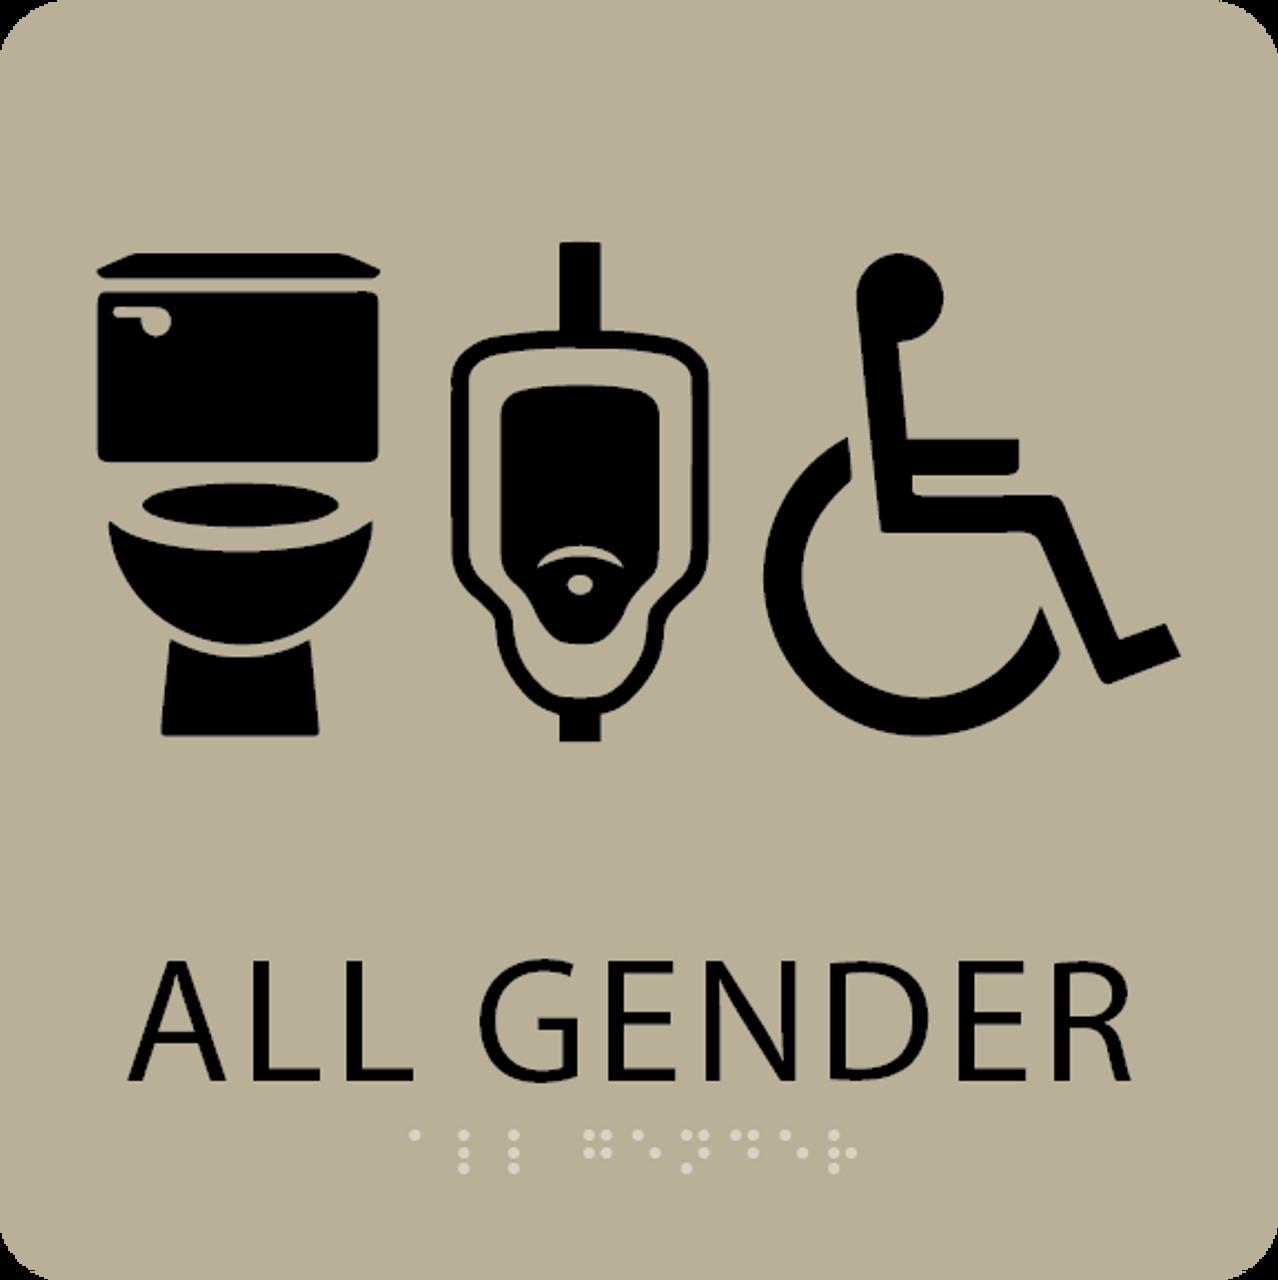 Khaki All Gender Neutral Restroom Sign